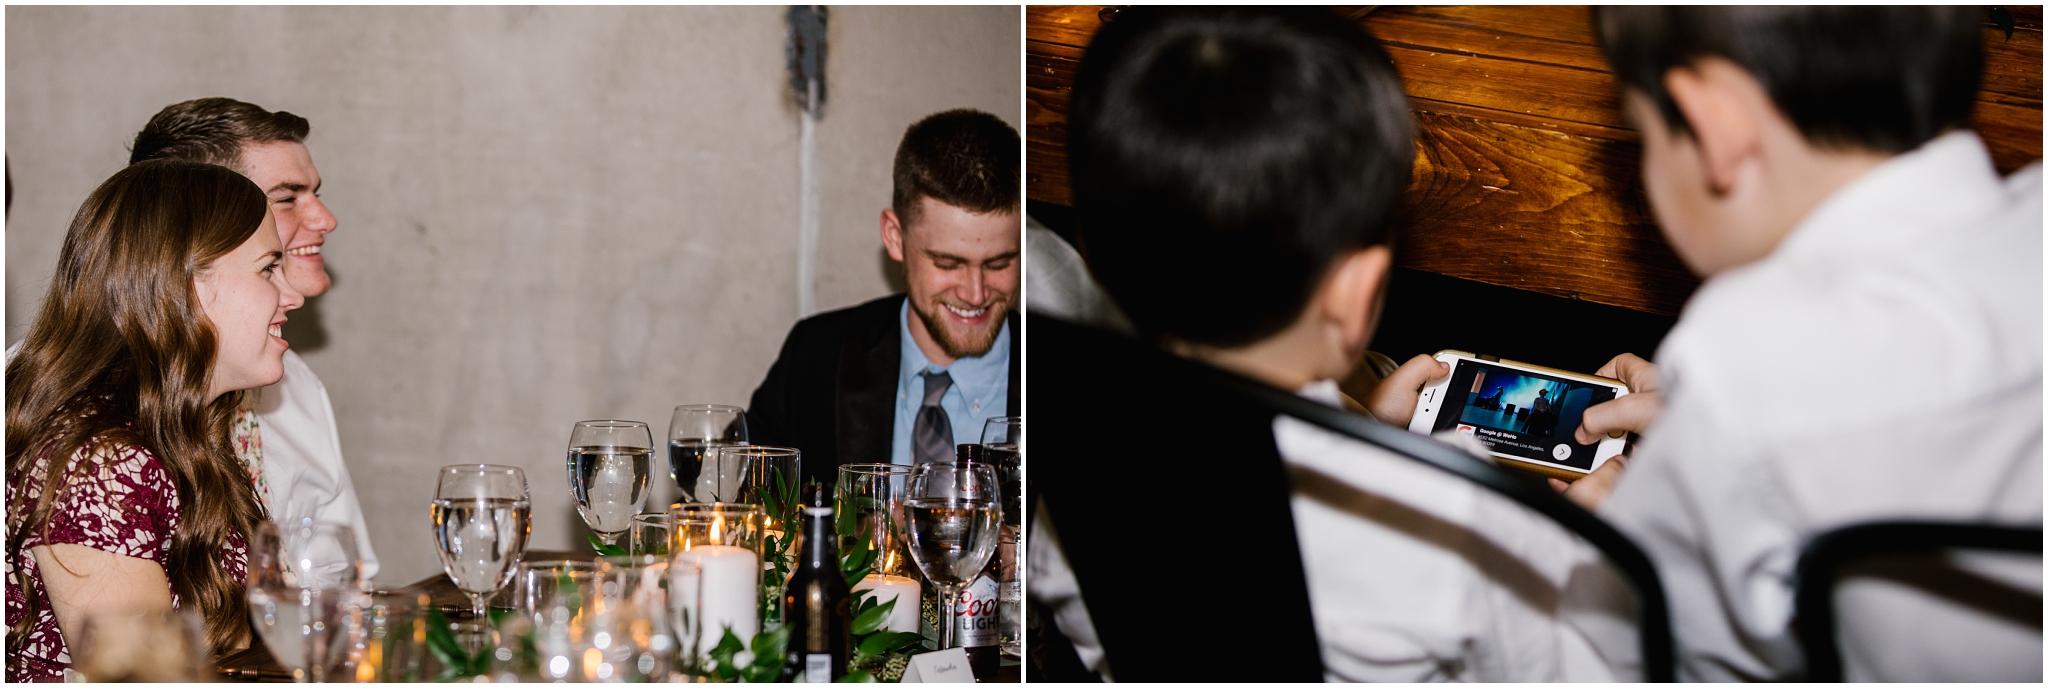 CN-Wedding-372_Lizzie-B-Imagery-Utah-Wedding-Photographer-Blessed-Sacrament-Catholic-Church-Sandy-Utah-The-Blended-Table-Salt-Lake-City.jpg